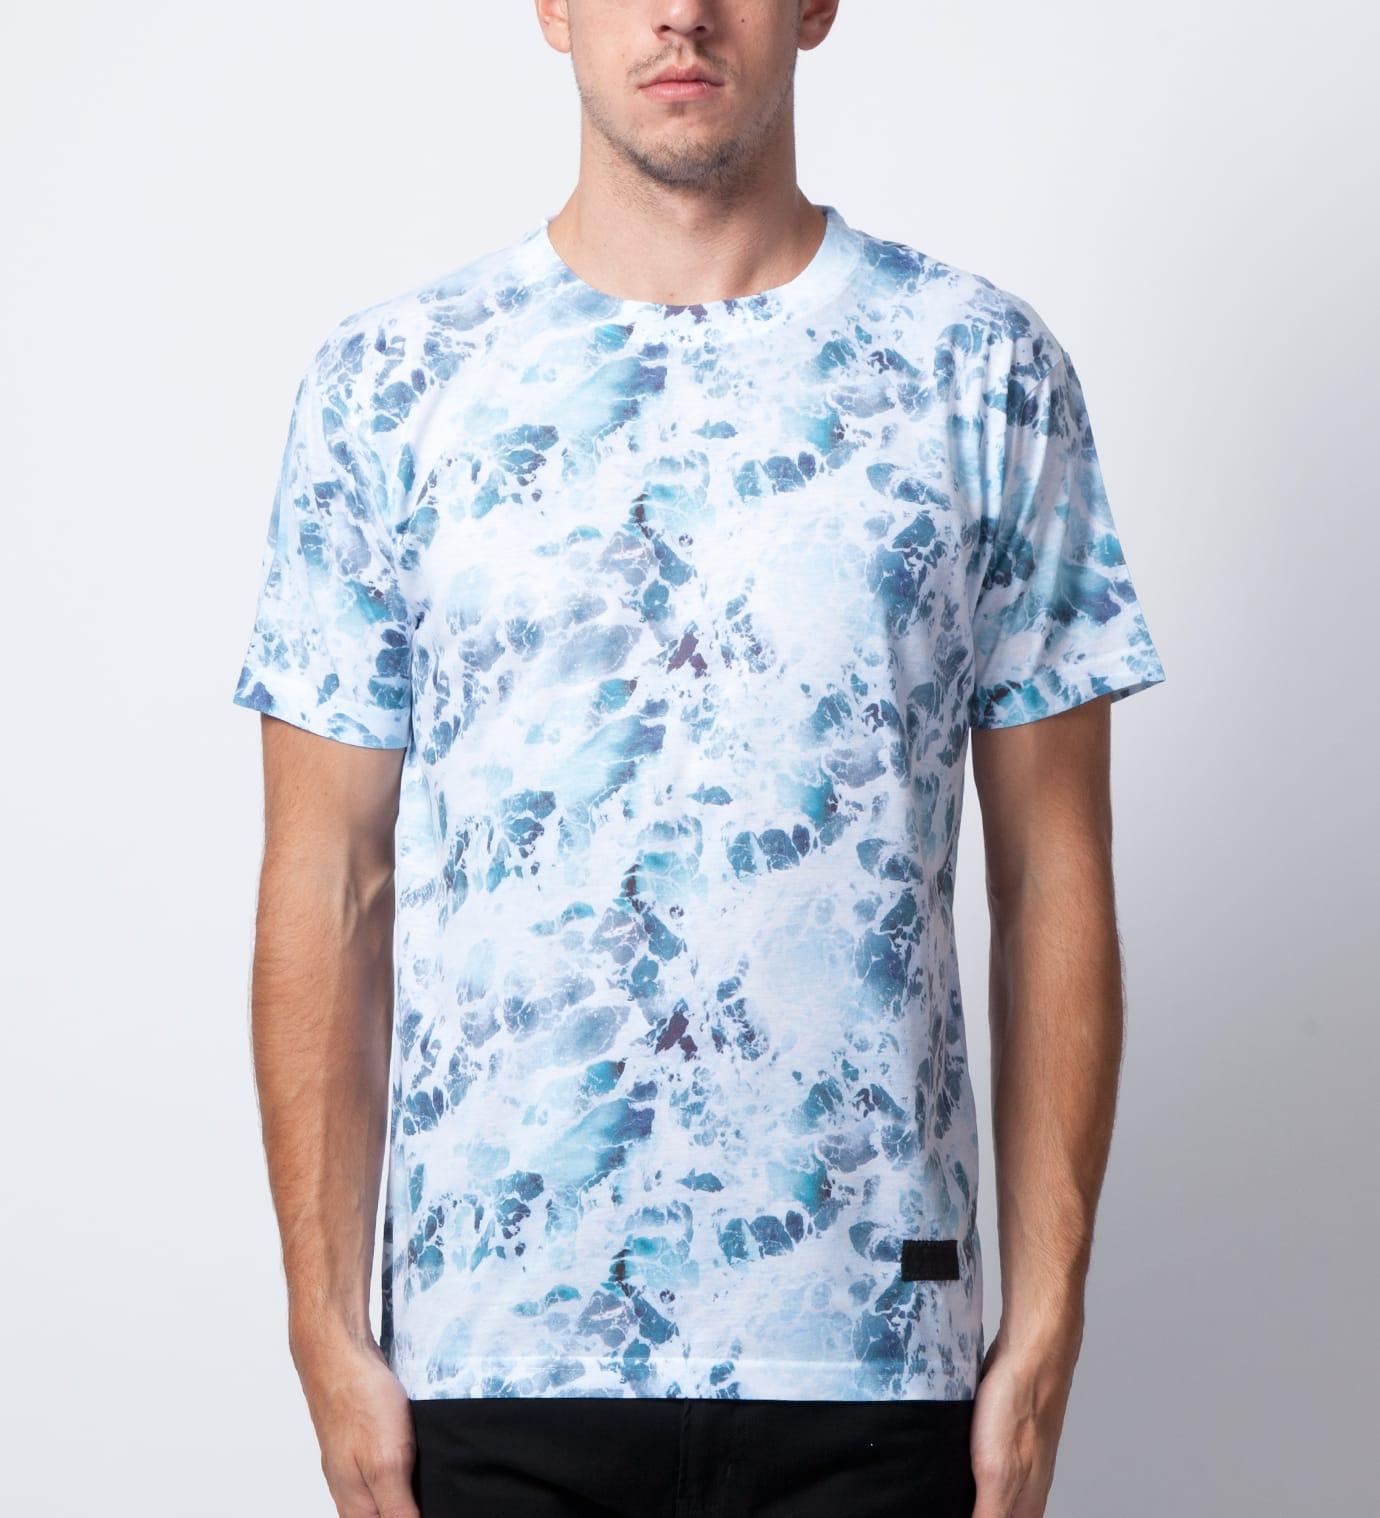 Patrik Ervell - Ocean Print All Over Printed T-Shirt  | HBX